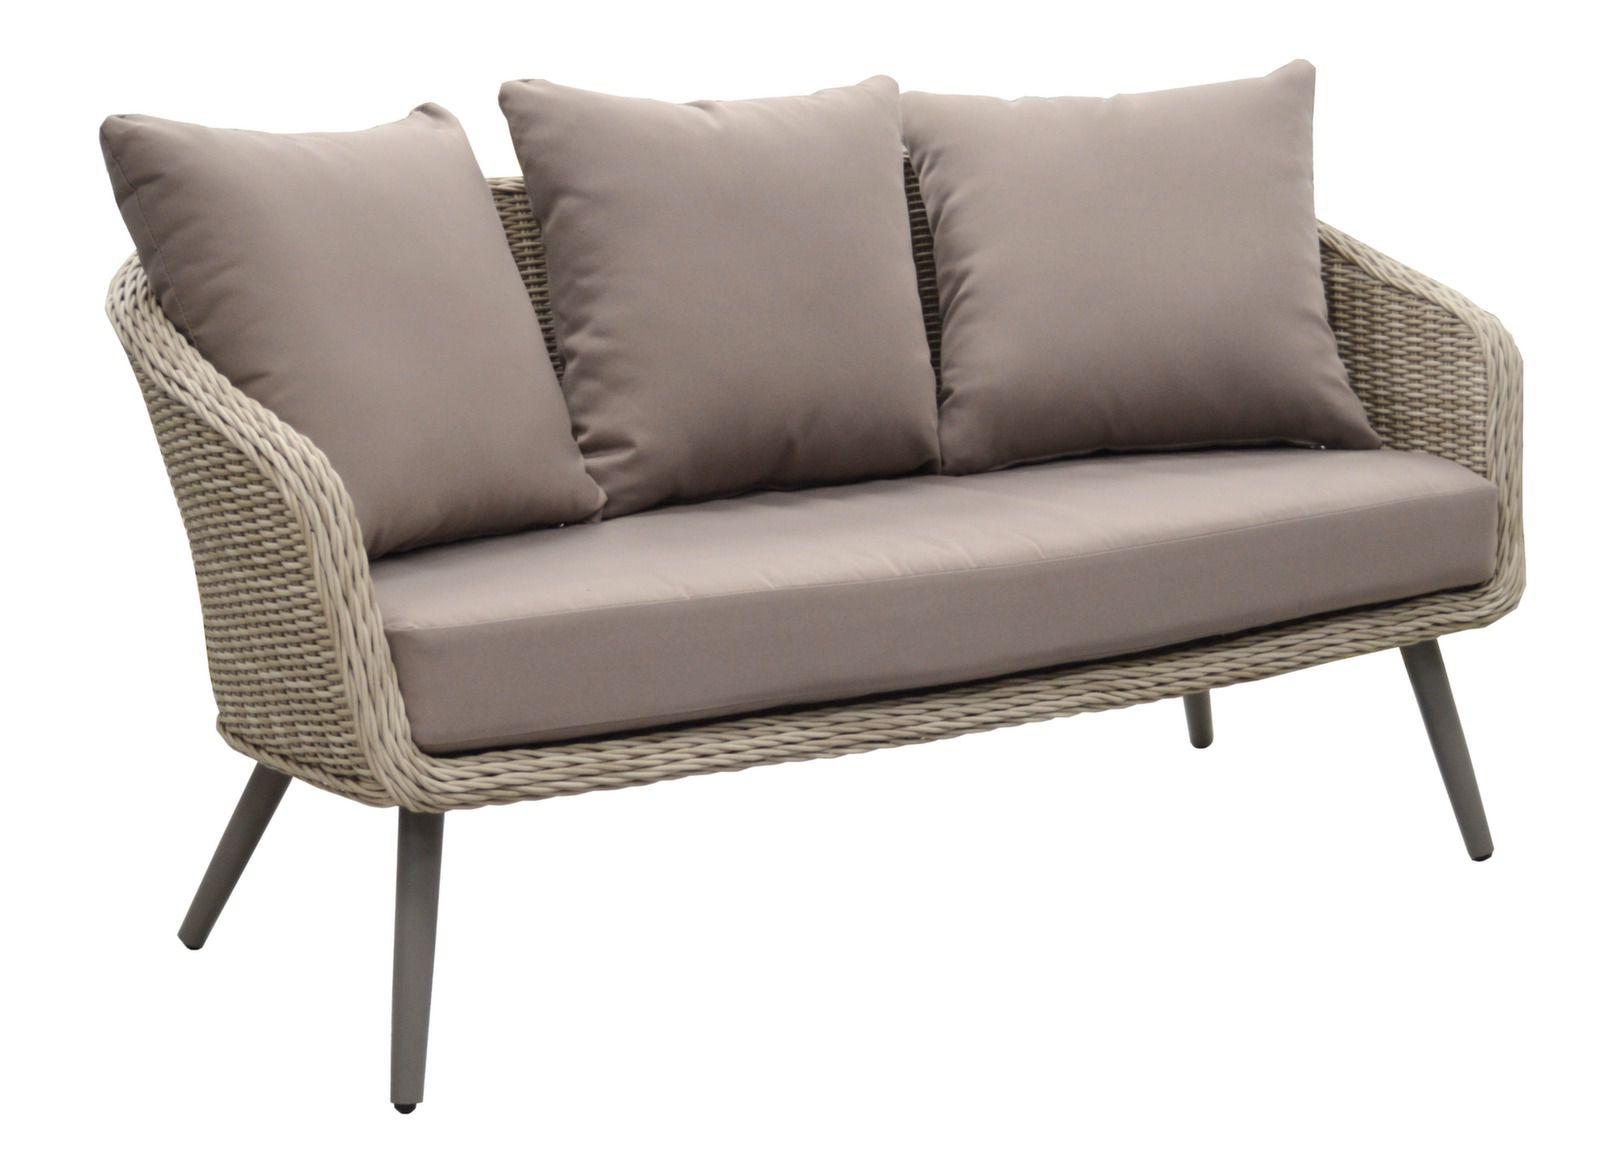 salon de jardin augusta canap fauteuils table basse. Black Bedroom Furniture Sets. Home Design Ideas